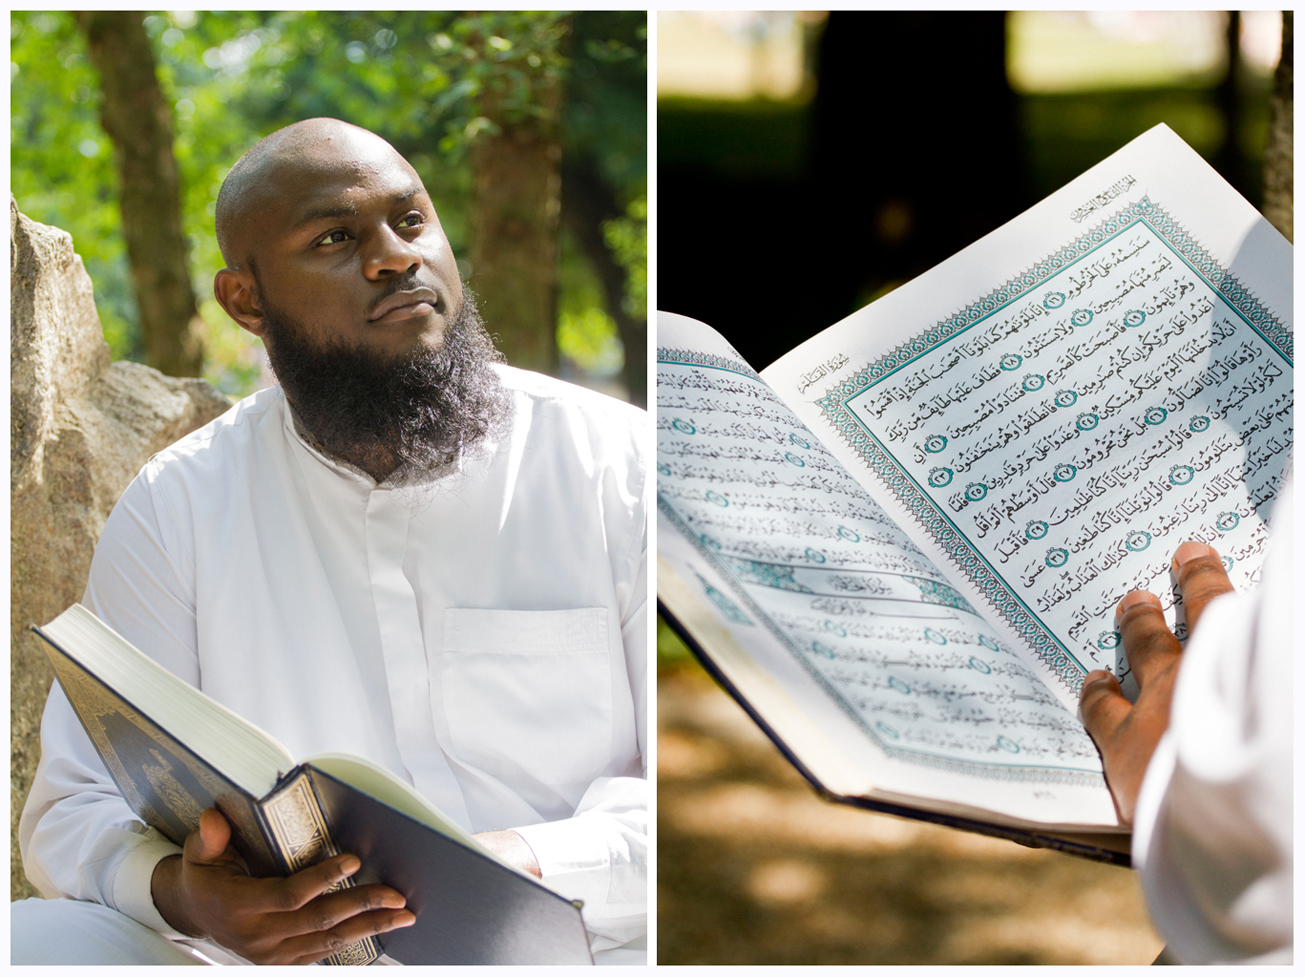 Brother Umar